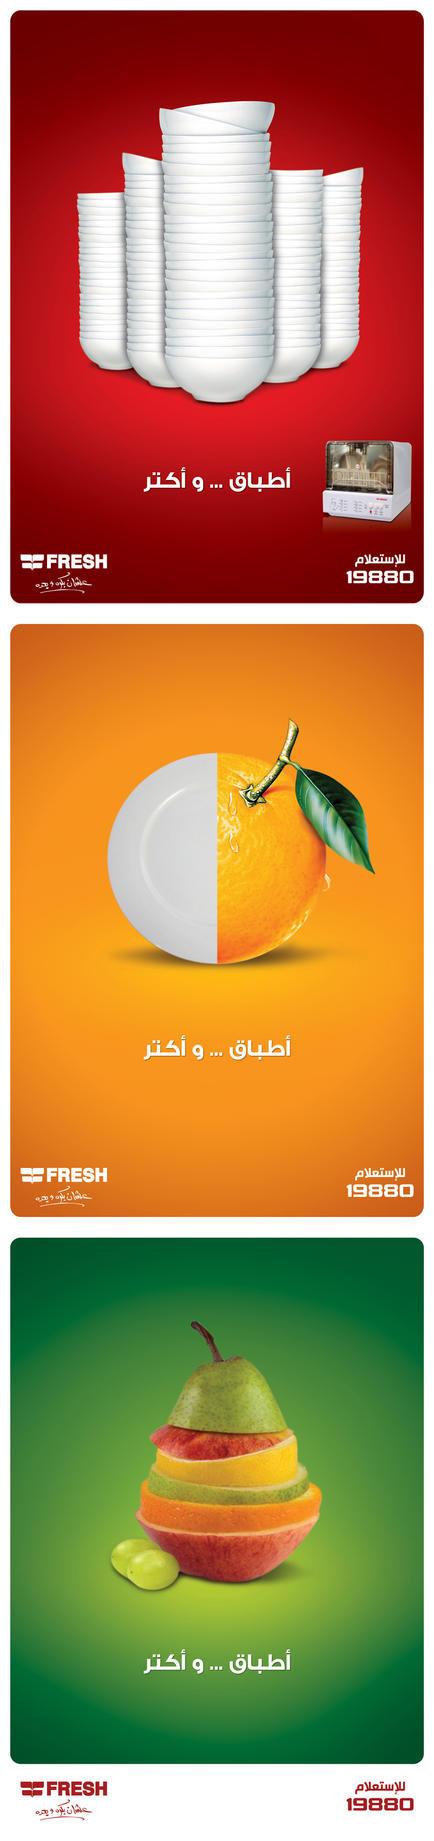 Fresh atba2 we 2aktar by mohamedfayez